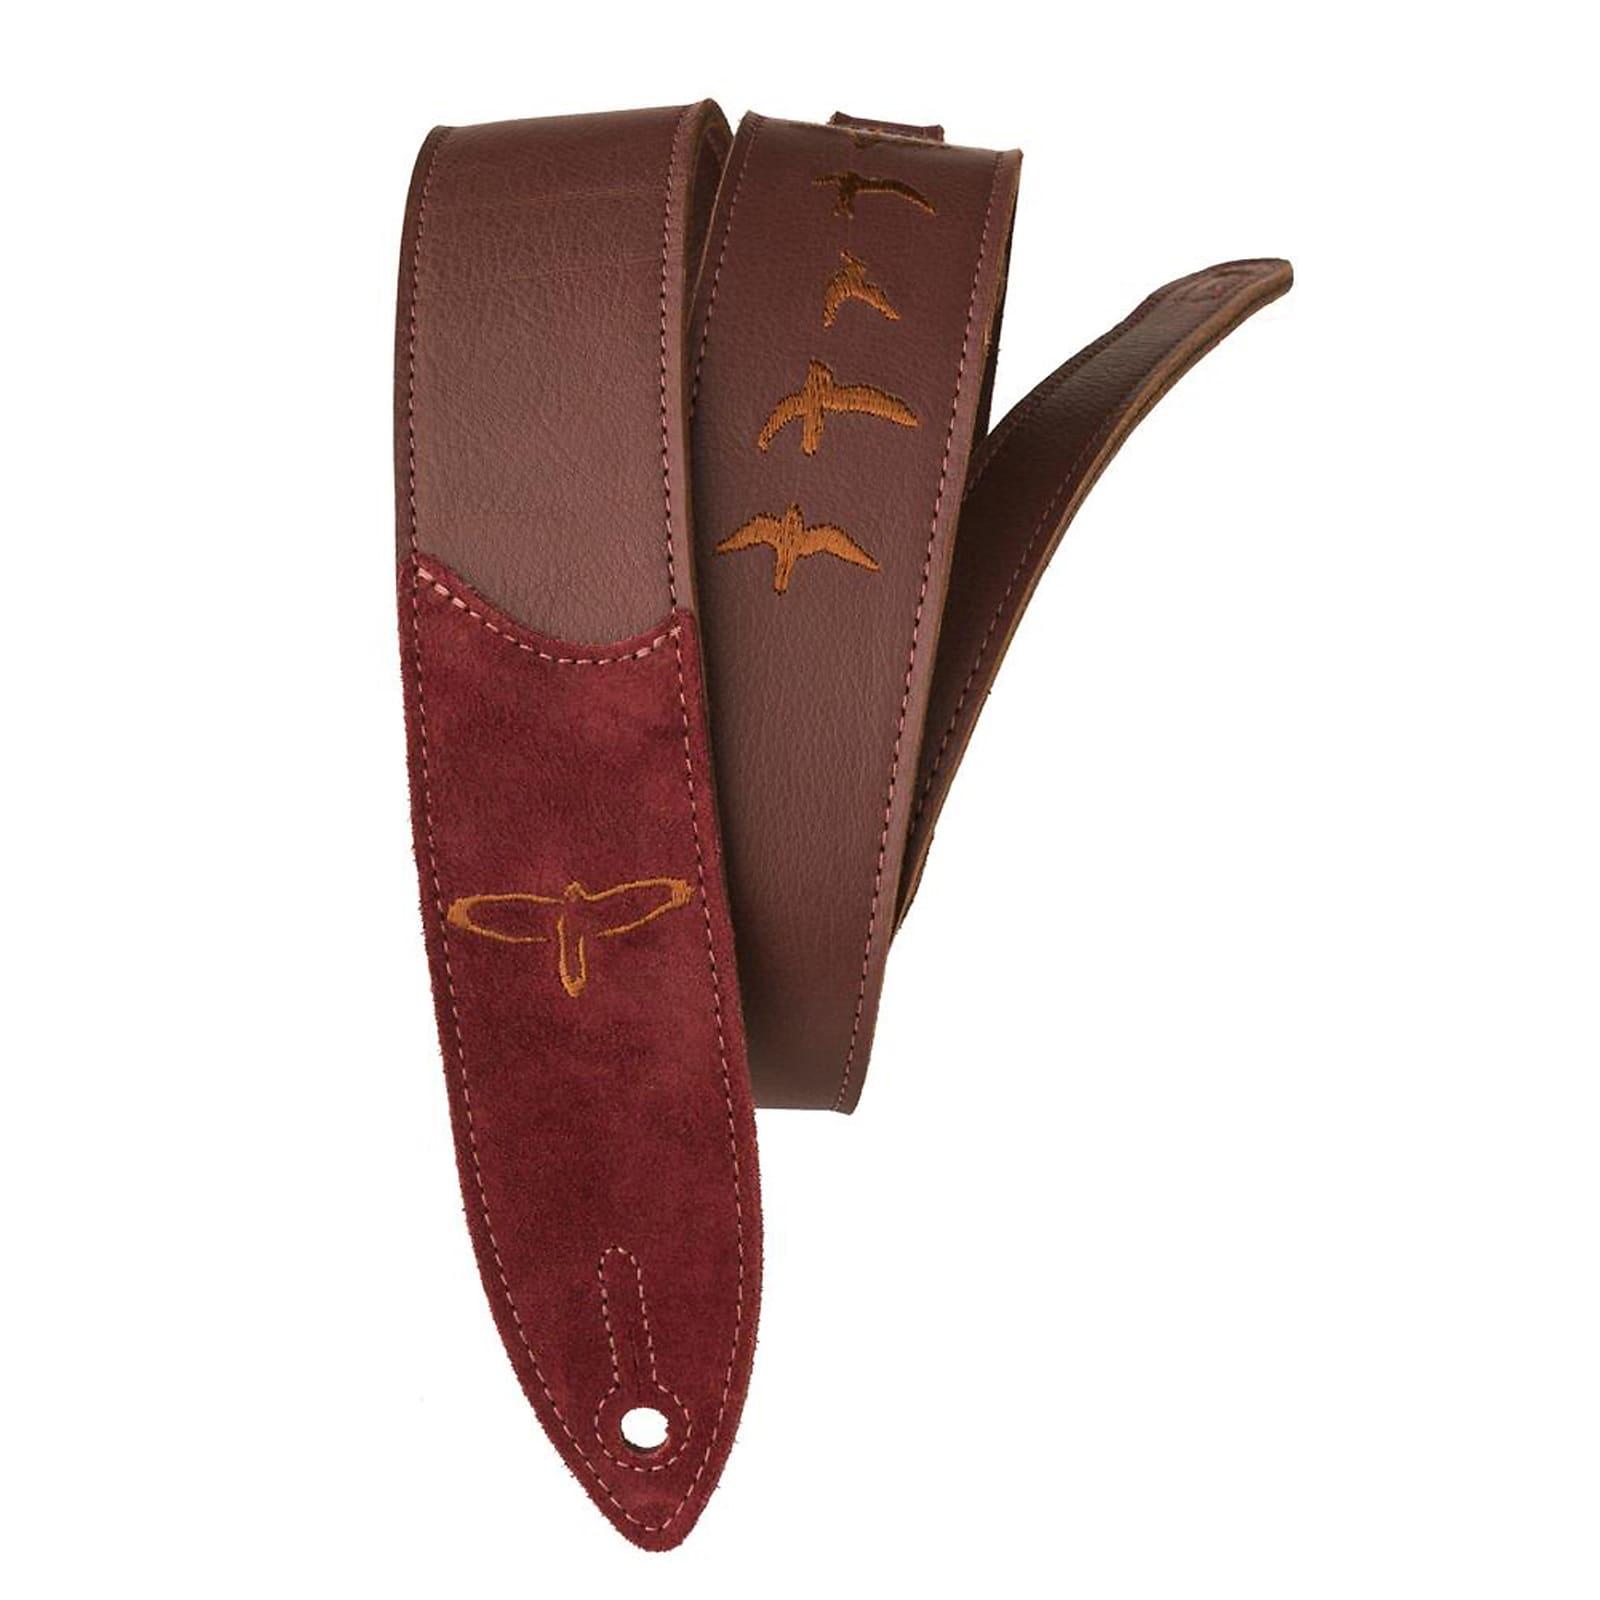 Paul Reed Smith PRS Premium Leather 2